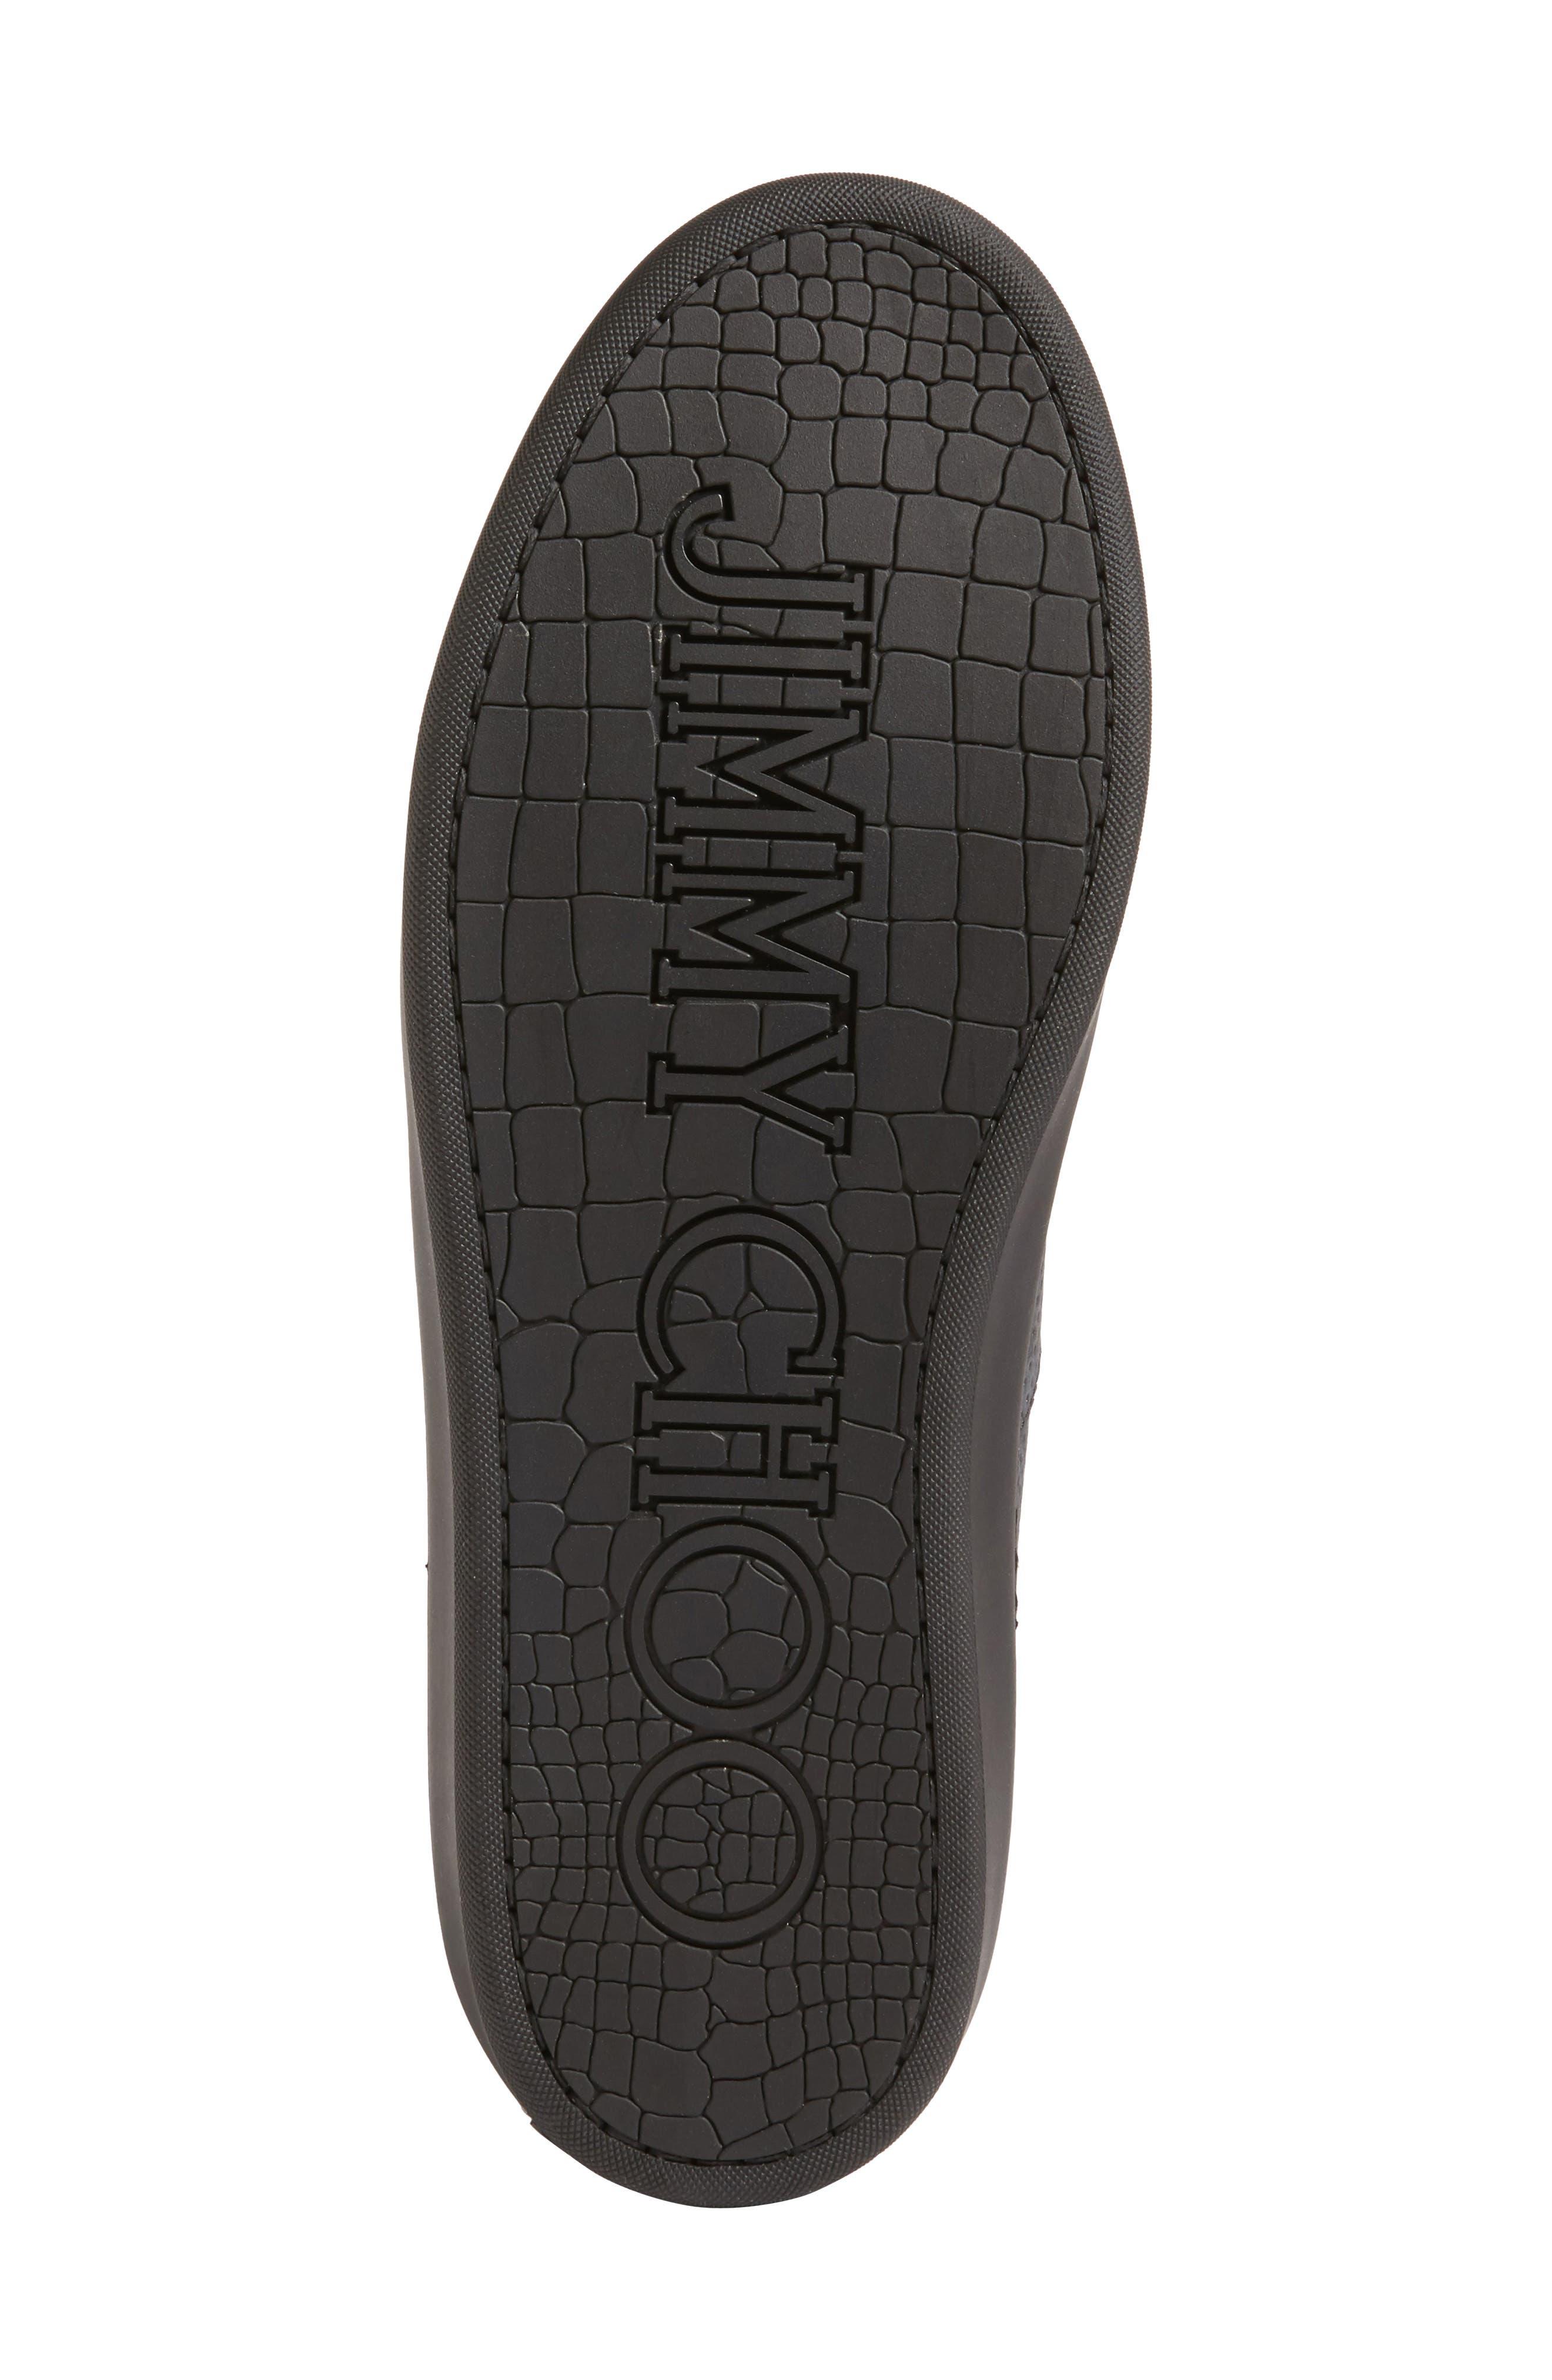 Belgravi Sneaker,                             Alternate thumbnail 6, color,                             Black/ Steel